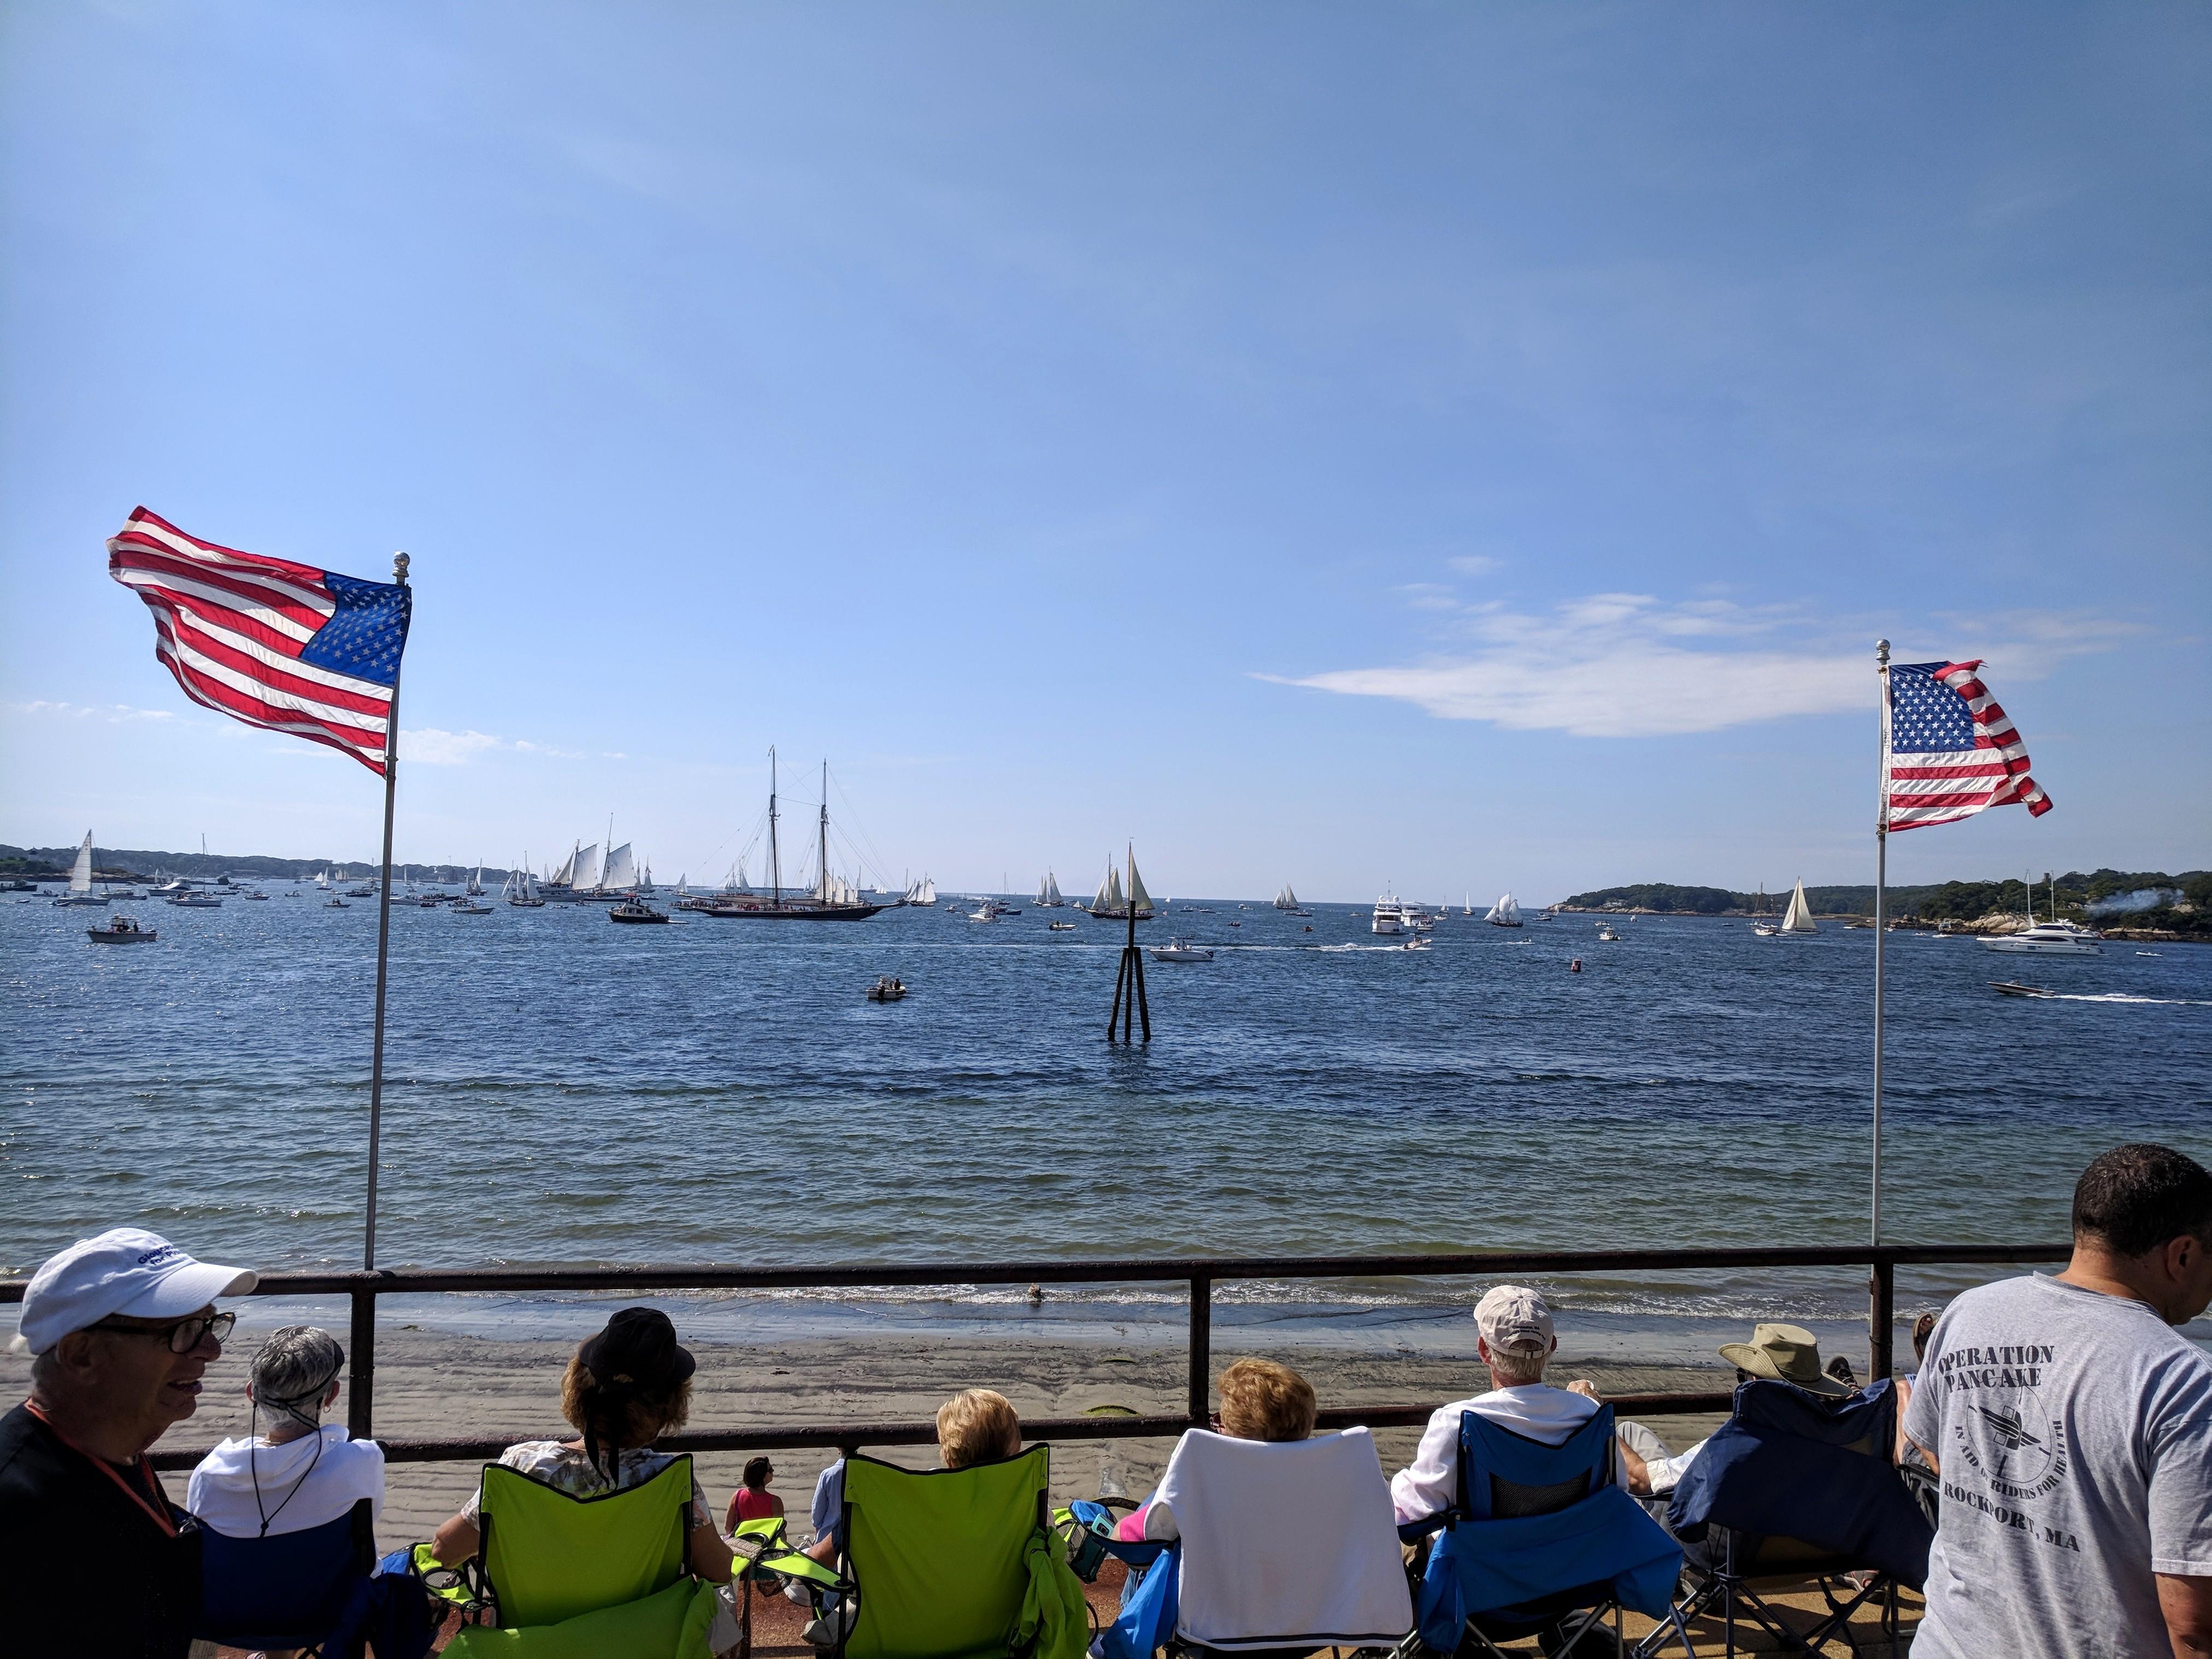 Parade of Sails Schooner Columbia rebuilt 2014 returns for Schooner Festival 2018_low tide ©c ryan.jpg